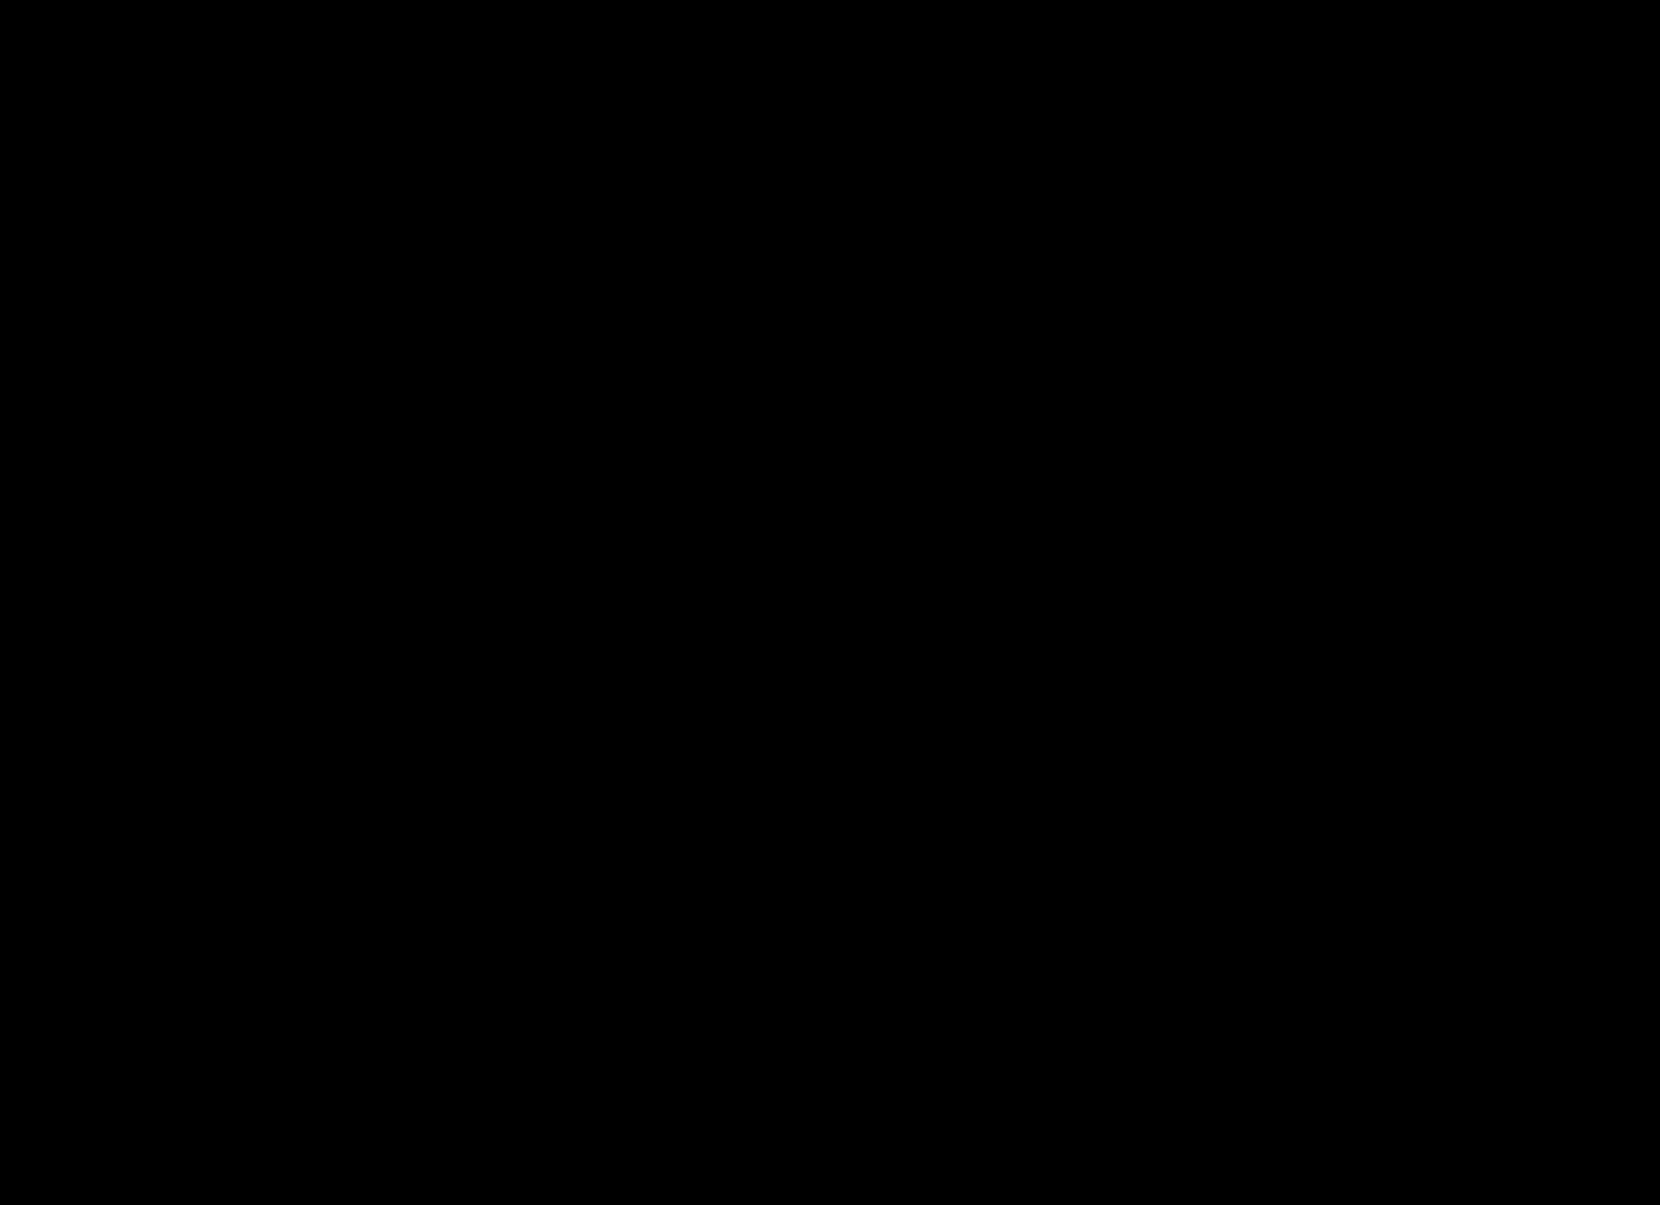 MAL-dPEG®₄-Lys(-5(6)-Carboxyfluorescein)-NH-m-dPEG®₂₄